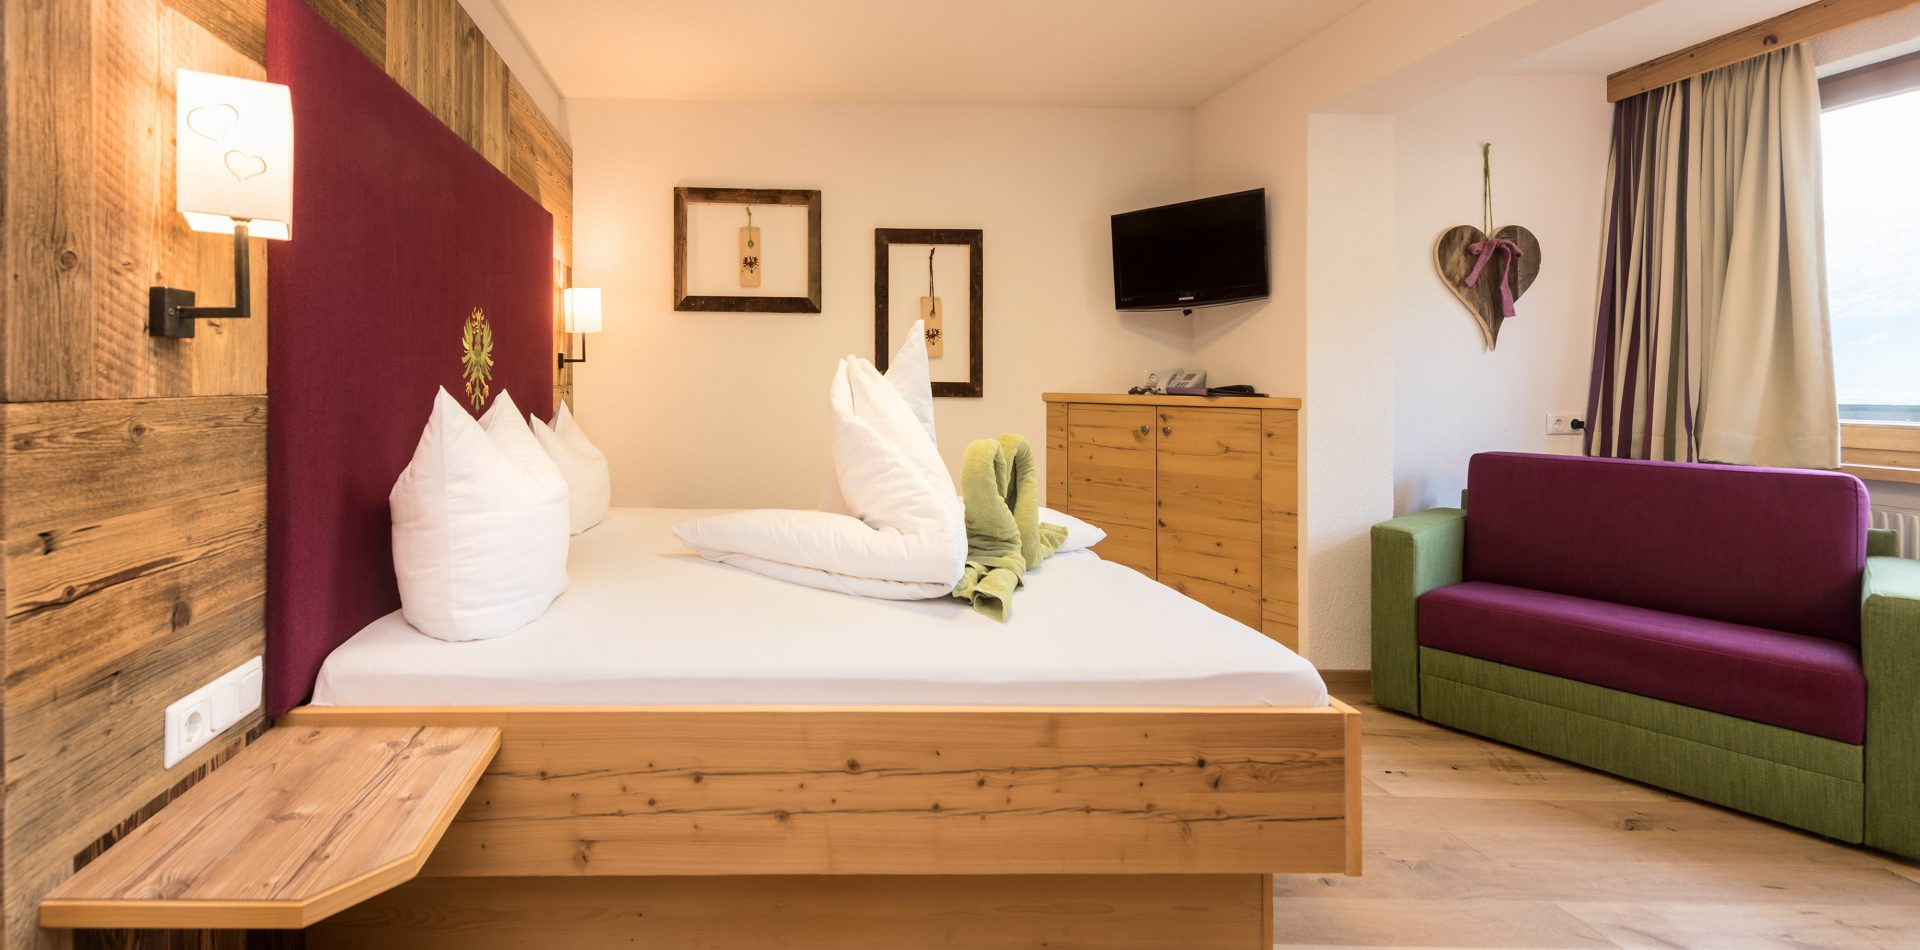 Zimmer im Hotel Erika im Stubaital